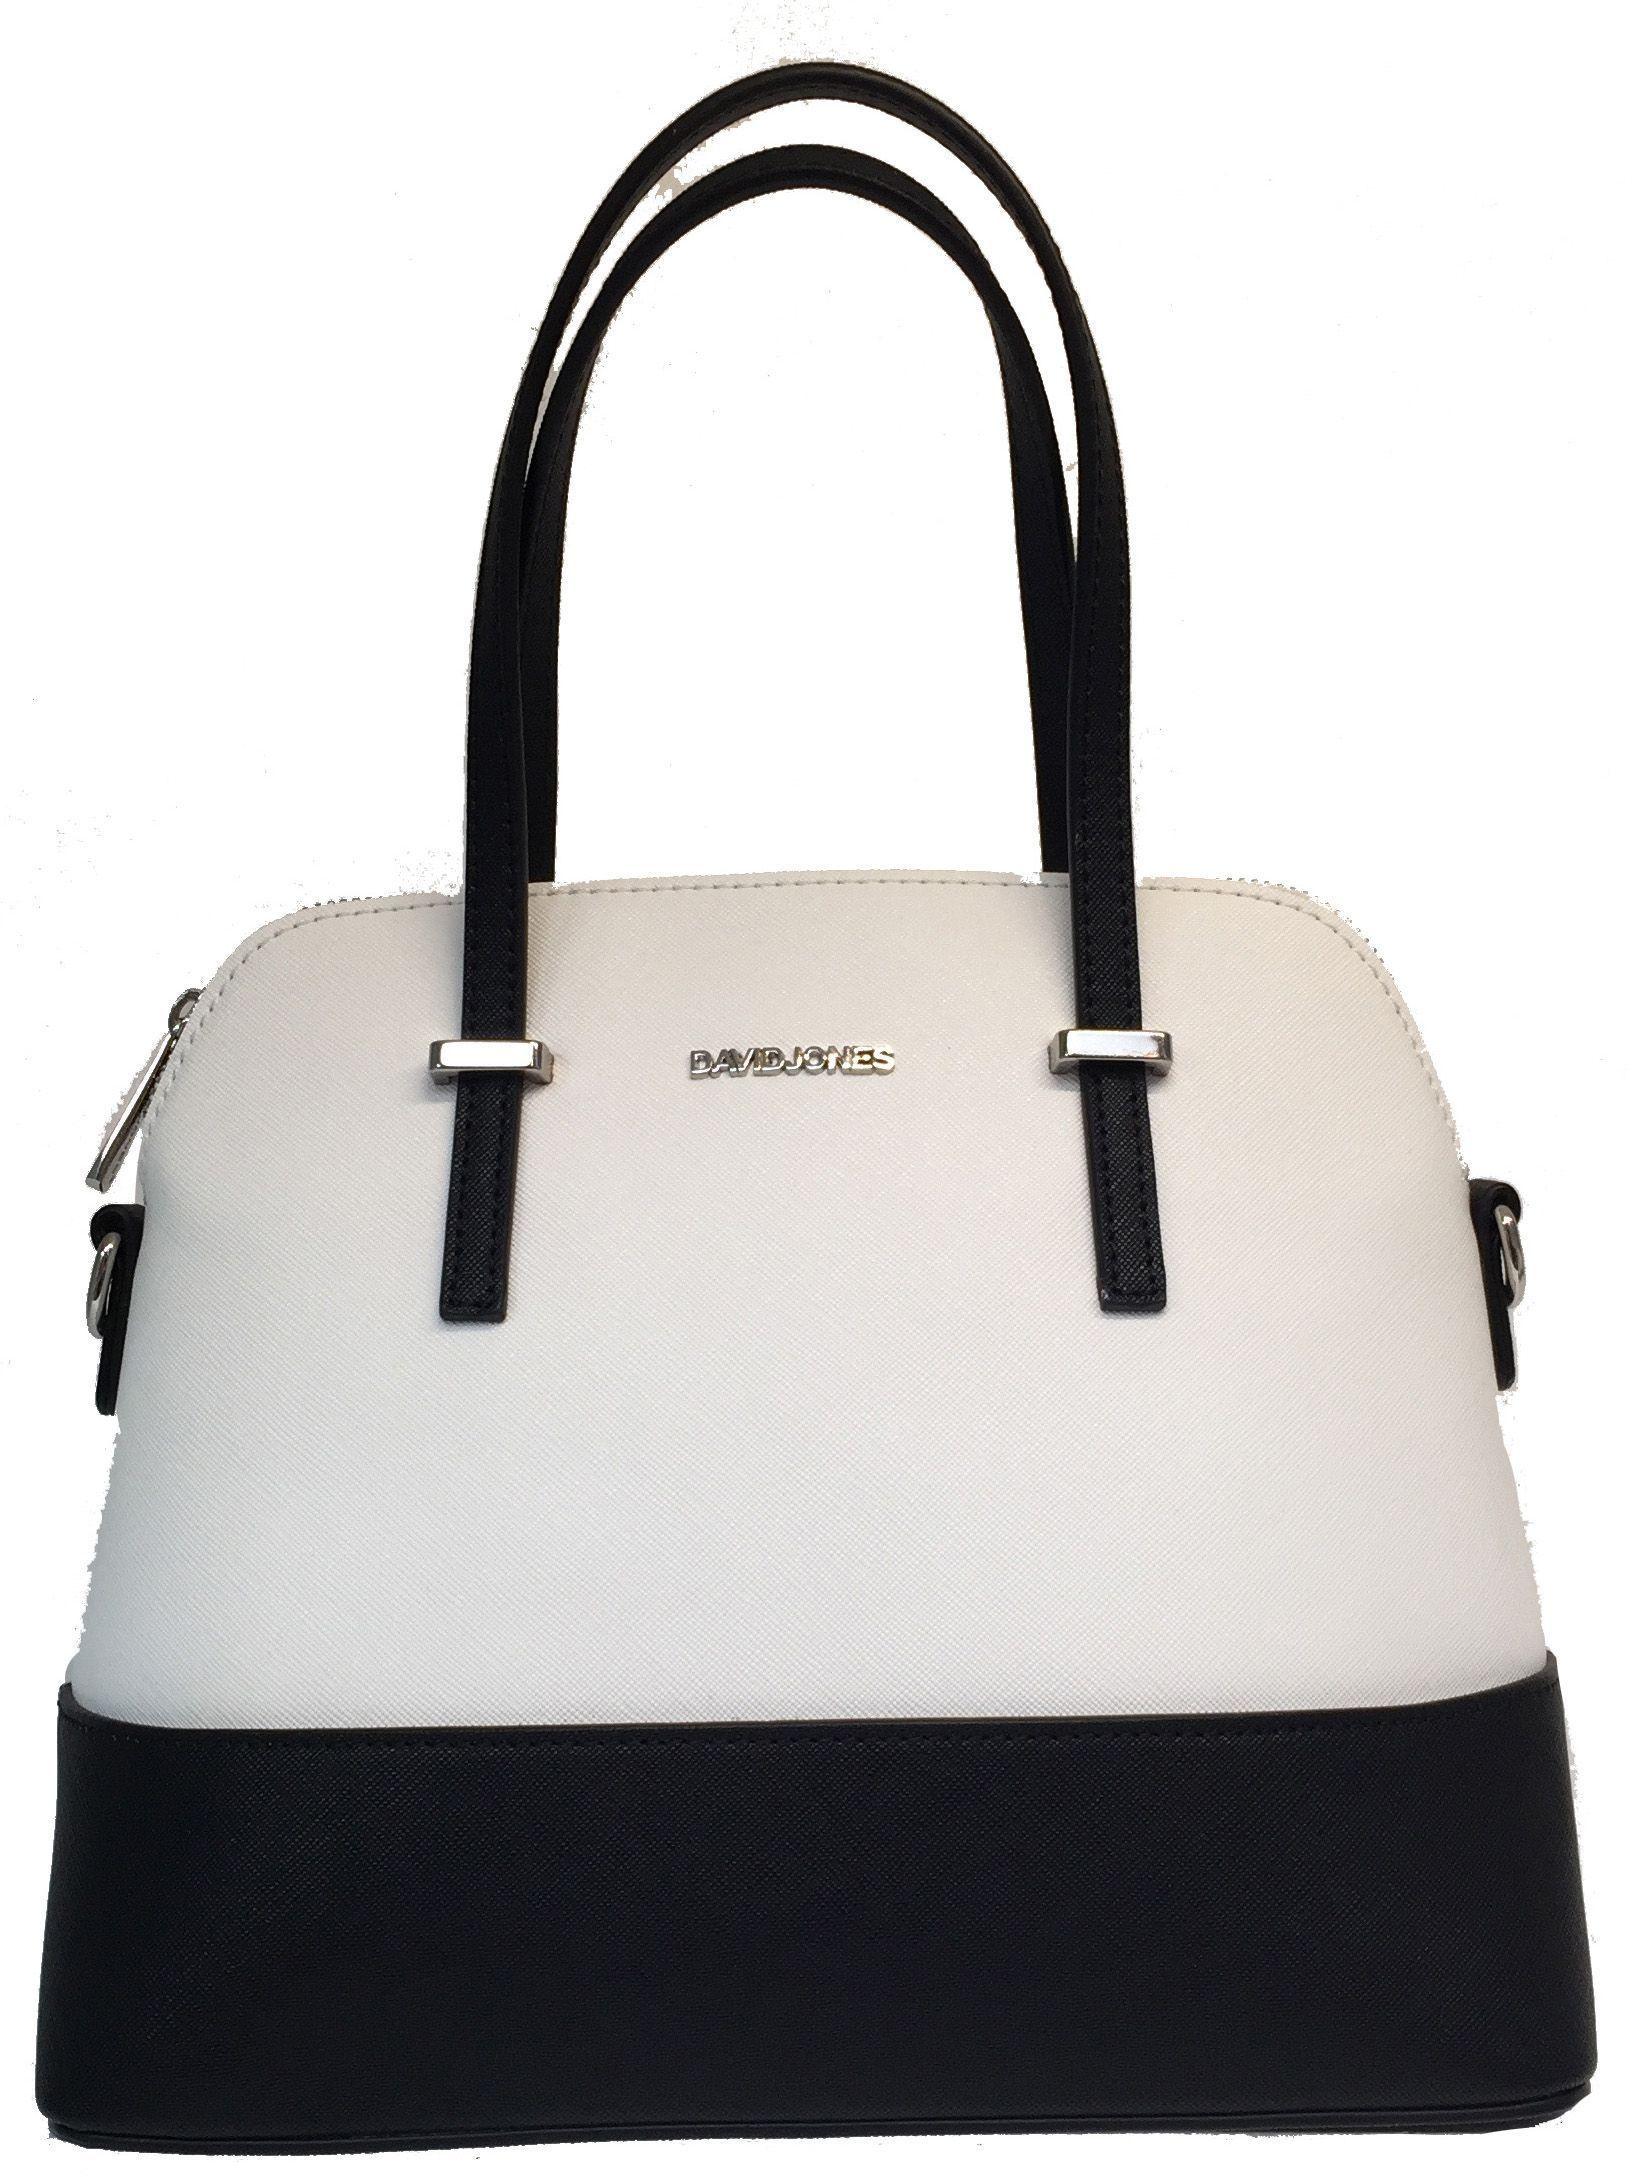 David Jones Black White Bag